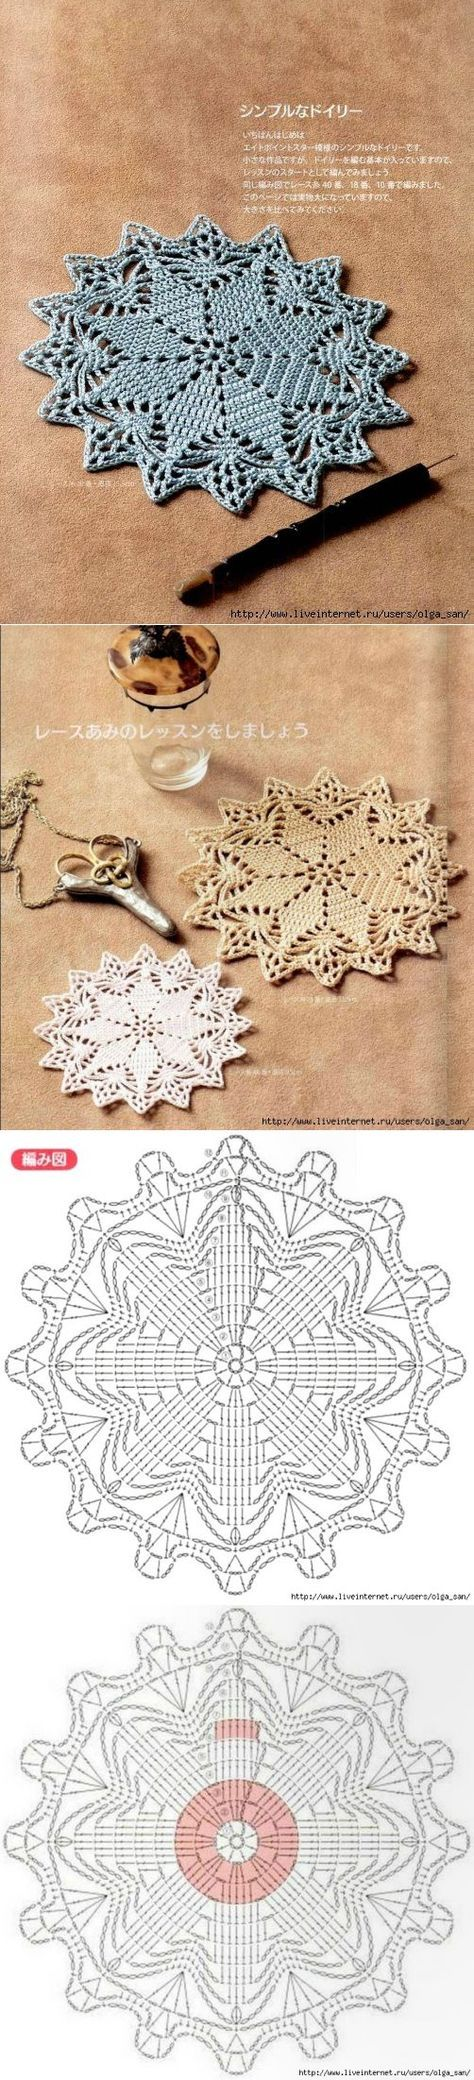 Crochet Doily Patterns Pinterest Diagram Doilies Free